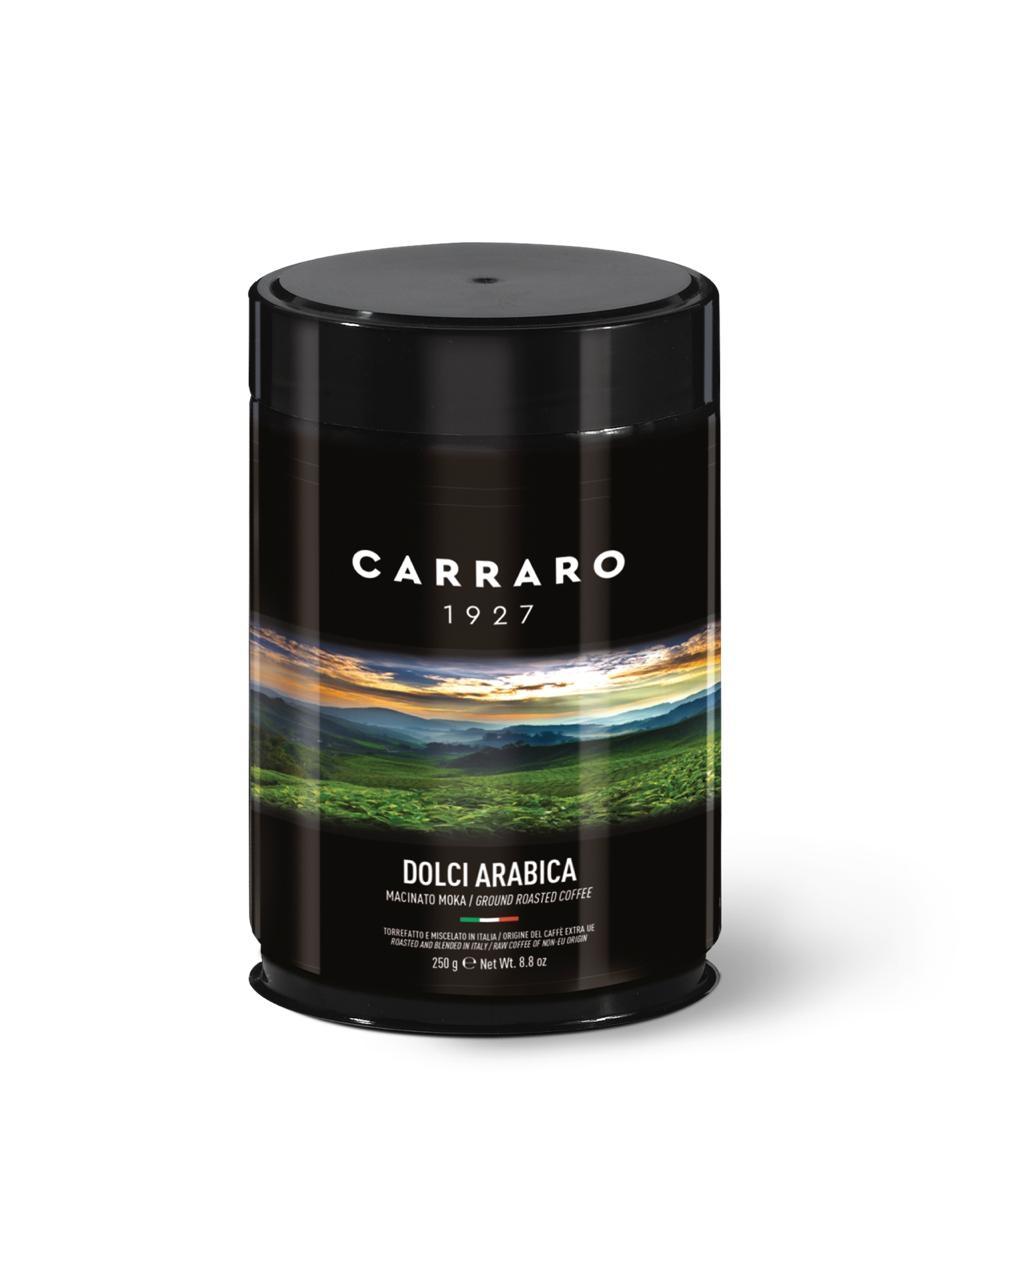 Carraro 250G Dolci Arabica Specialty ground coffee